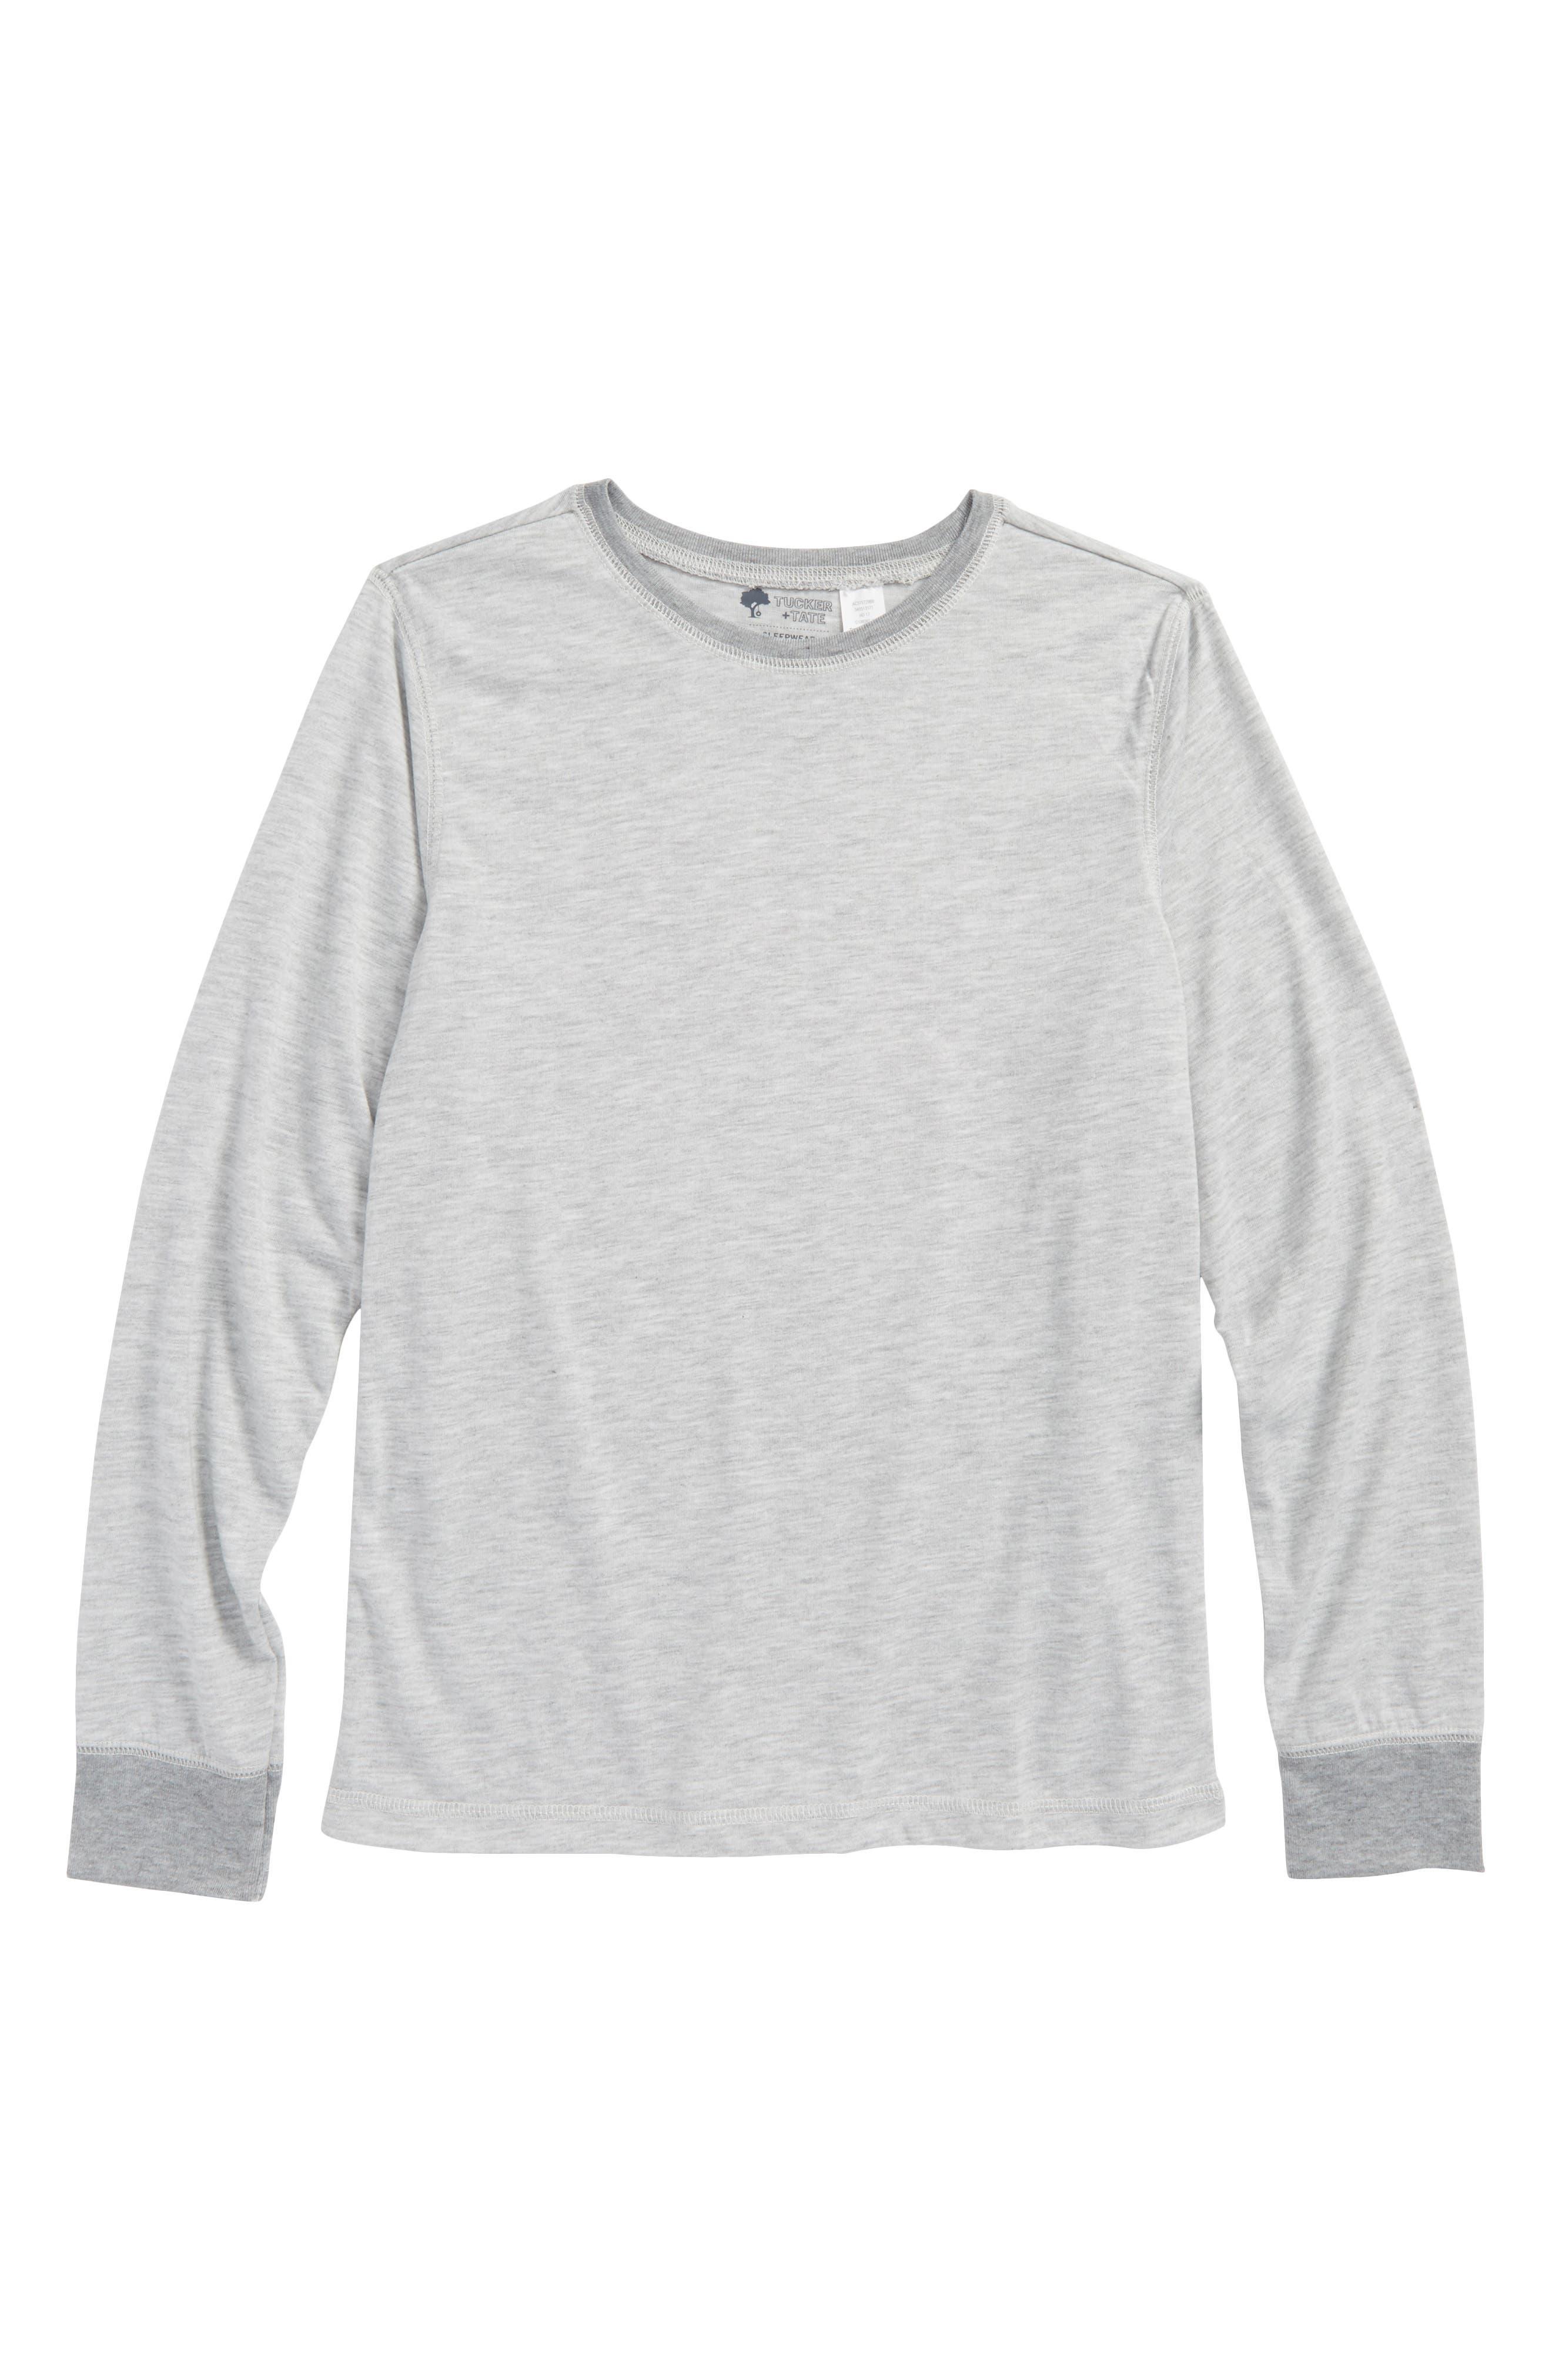 Tucker & Tate Long Sleeve Sleep T-Shirt,                             Main thumbnail 1, color,                             GREY ASH HEATHER